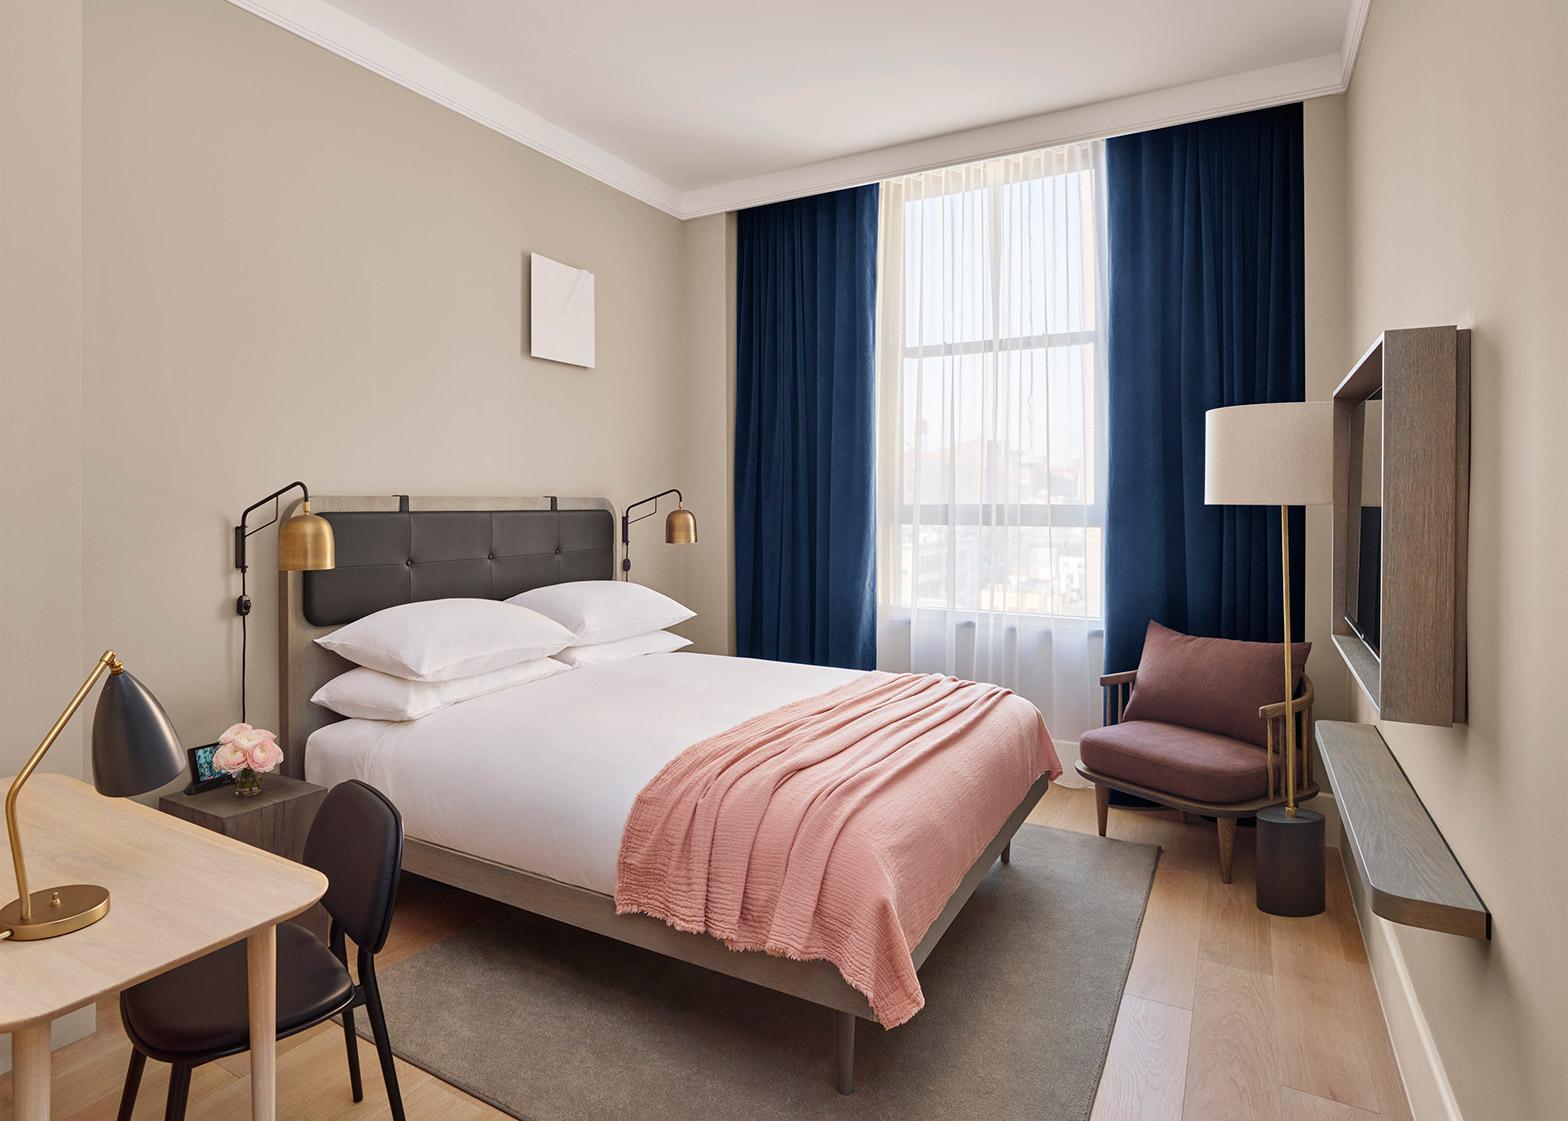 11-howard-space-copenhagen-hotel-interior-new-york-city-soho-usa_dezeen_1568_10